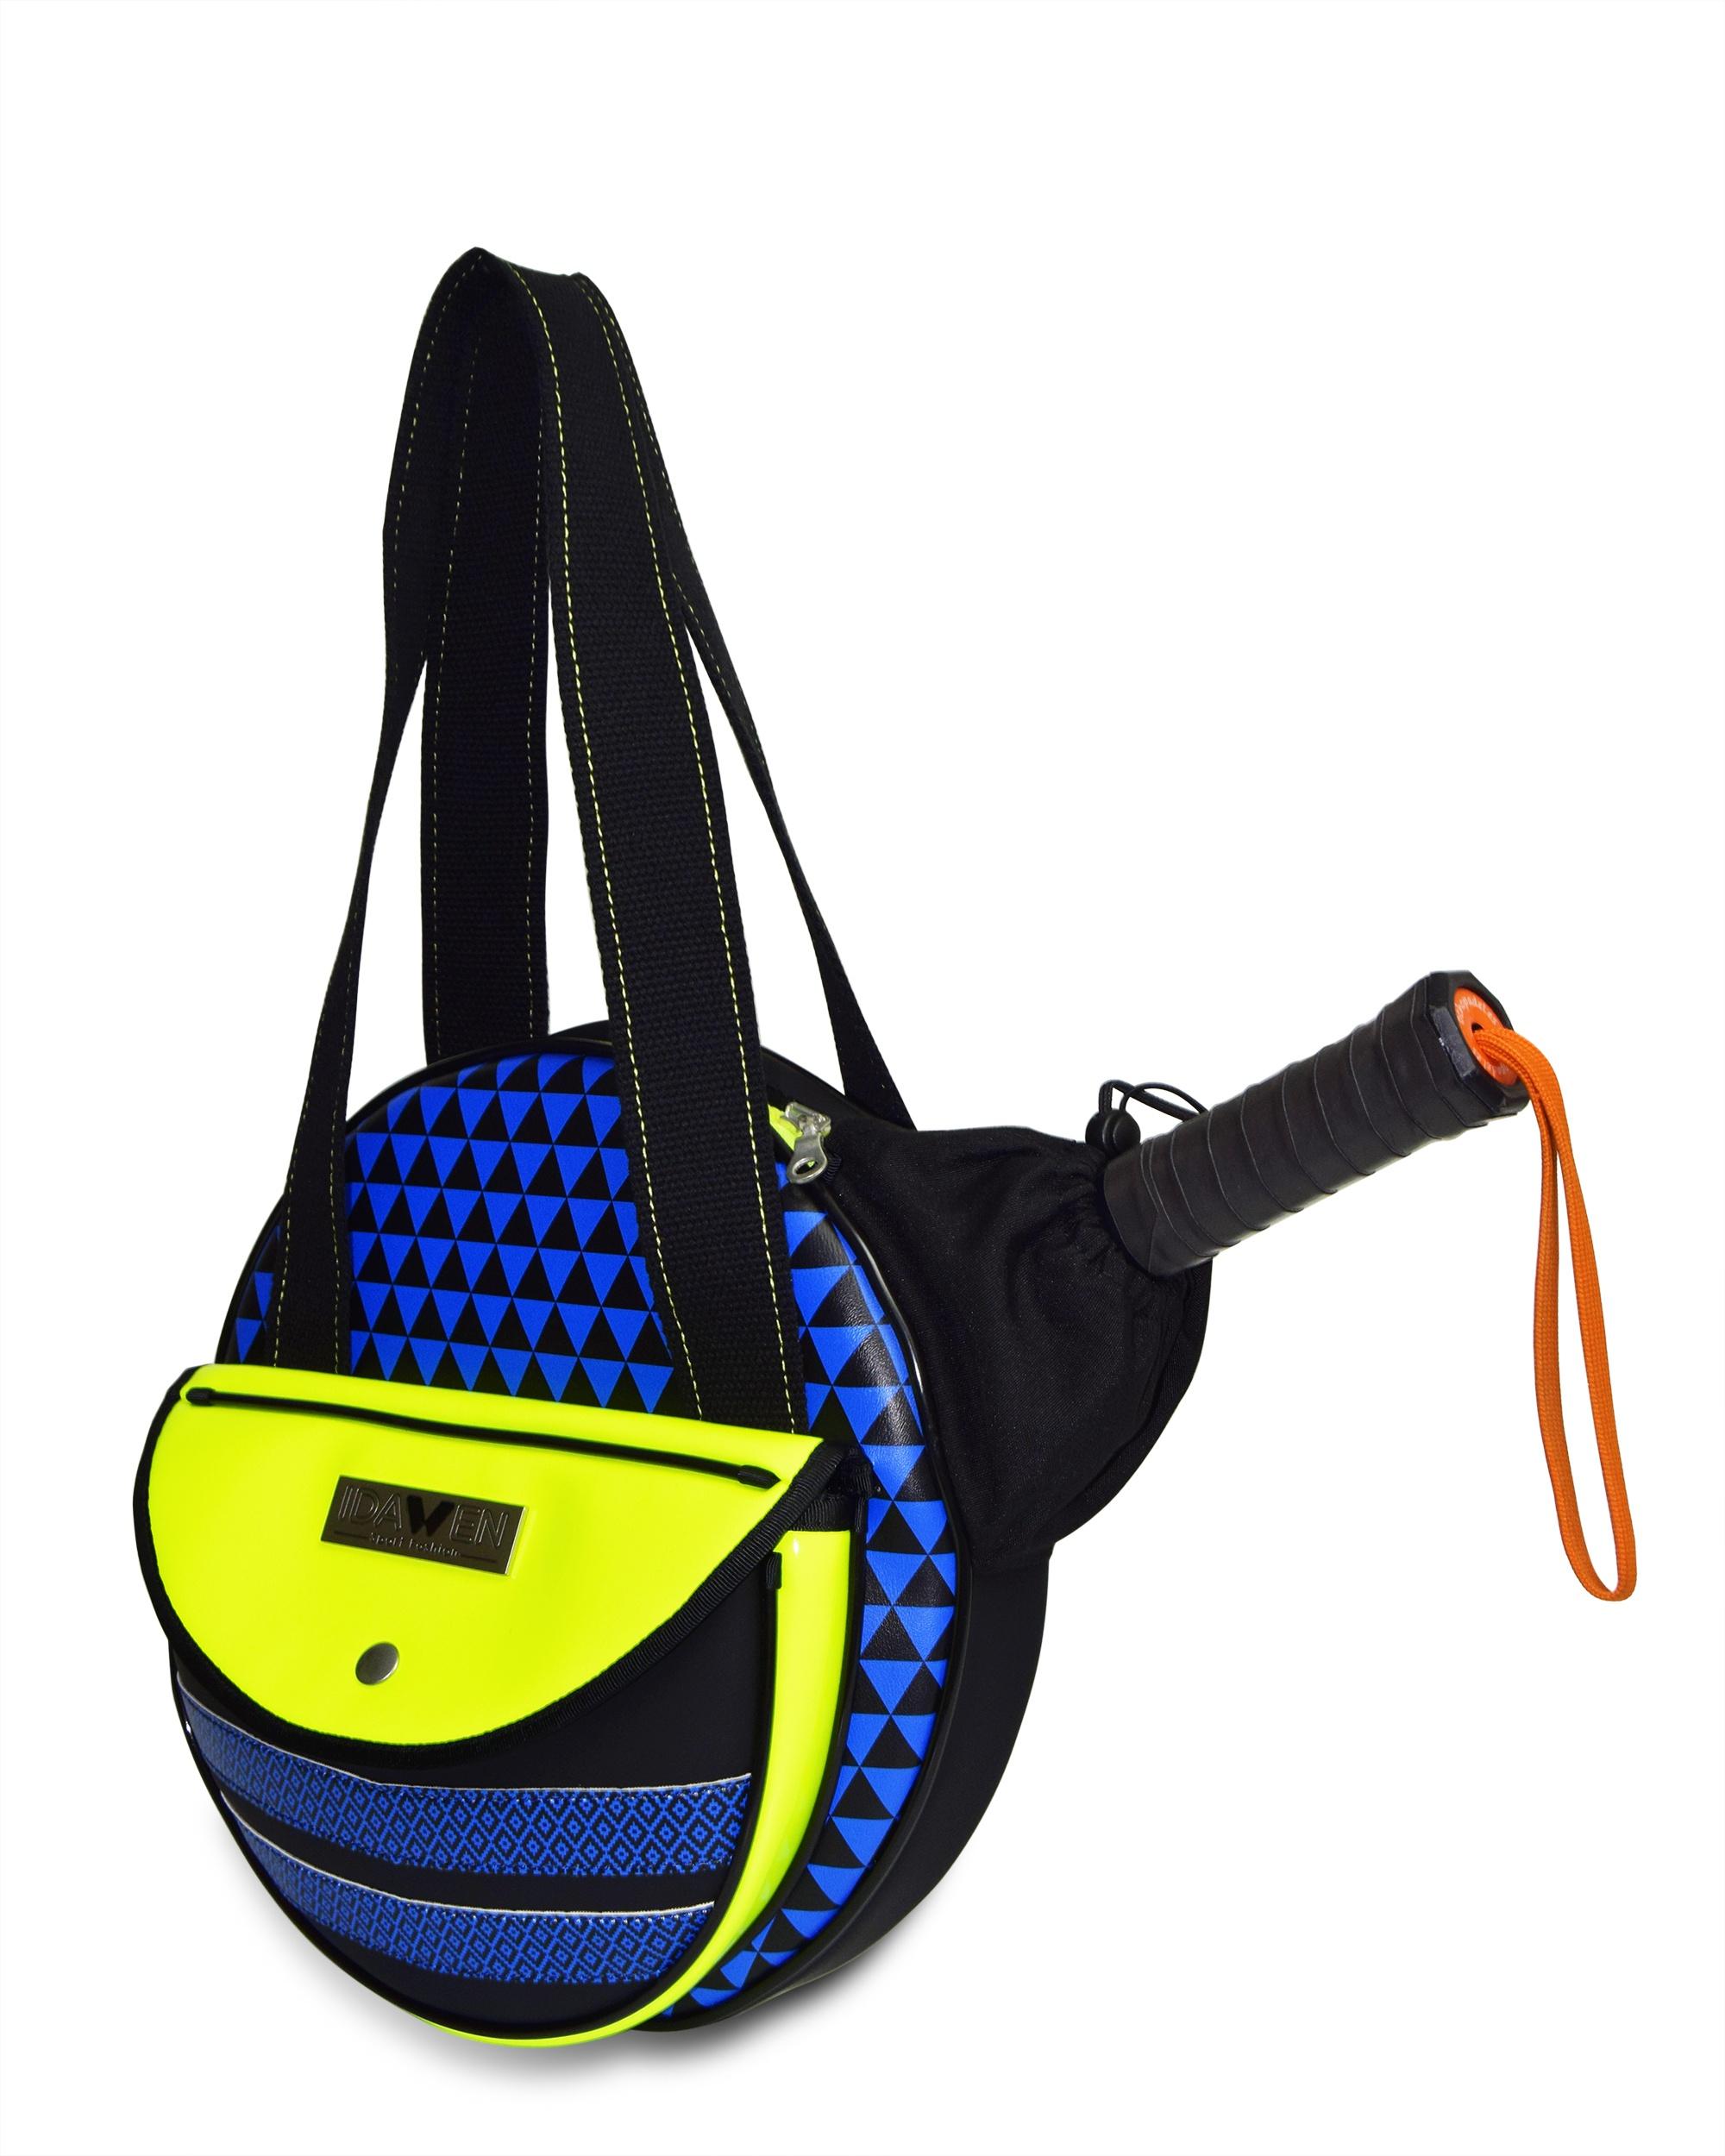 ba8fd1675e45 Designer Tennis Bag Reviews | Stanford Center for Opportunity Policy ...